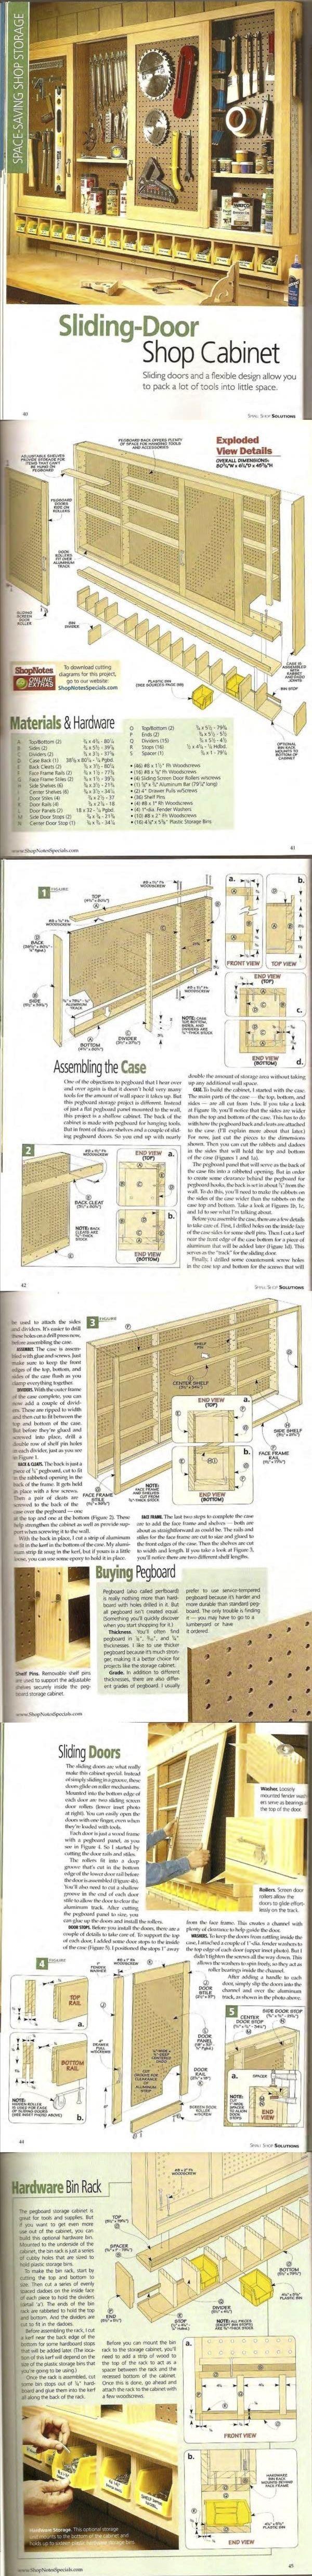 Sliding-Door Shop Cabinet / ShopNotes Magazine - Small Shop Solutions 1